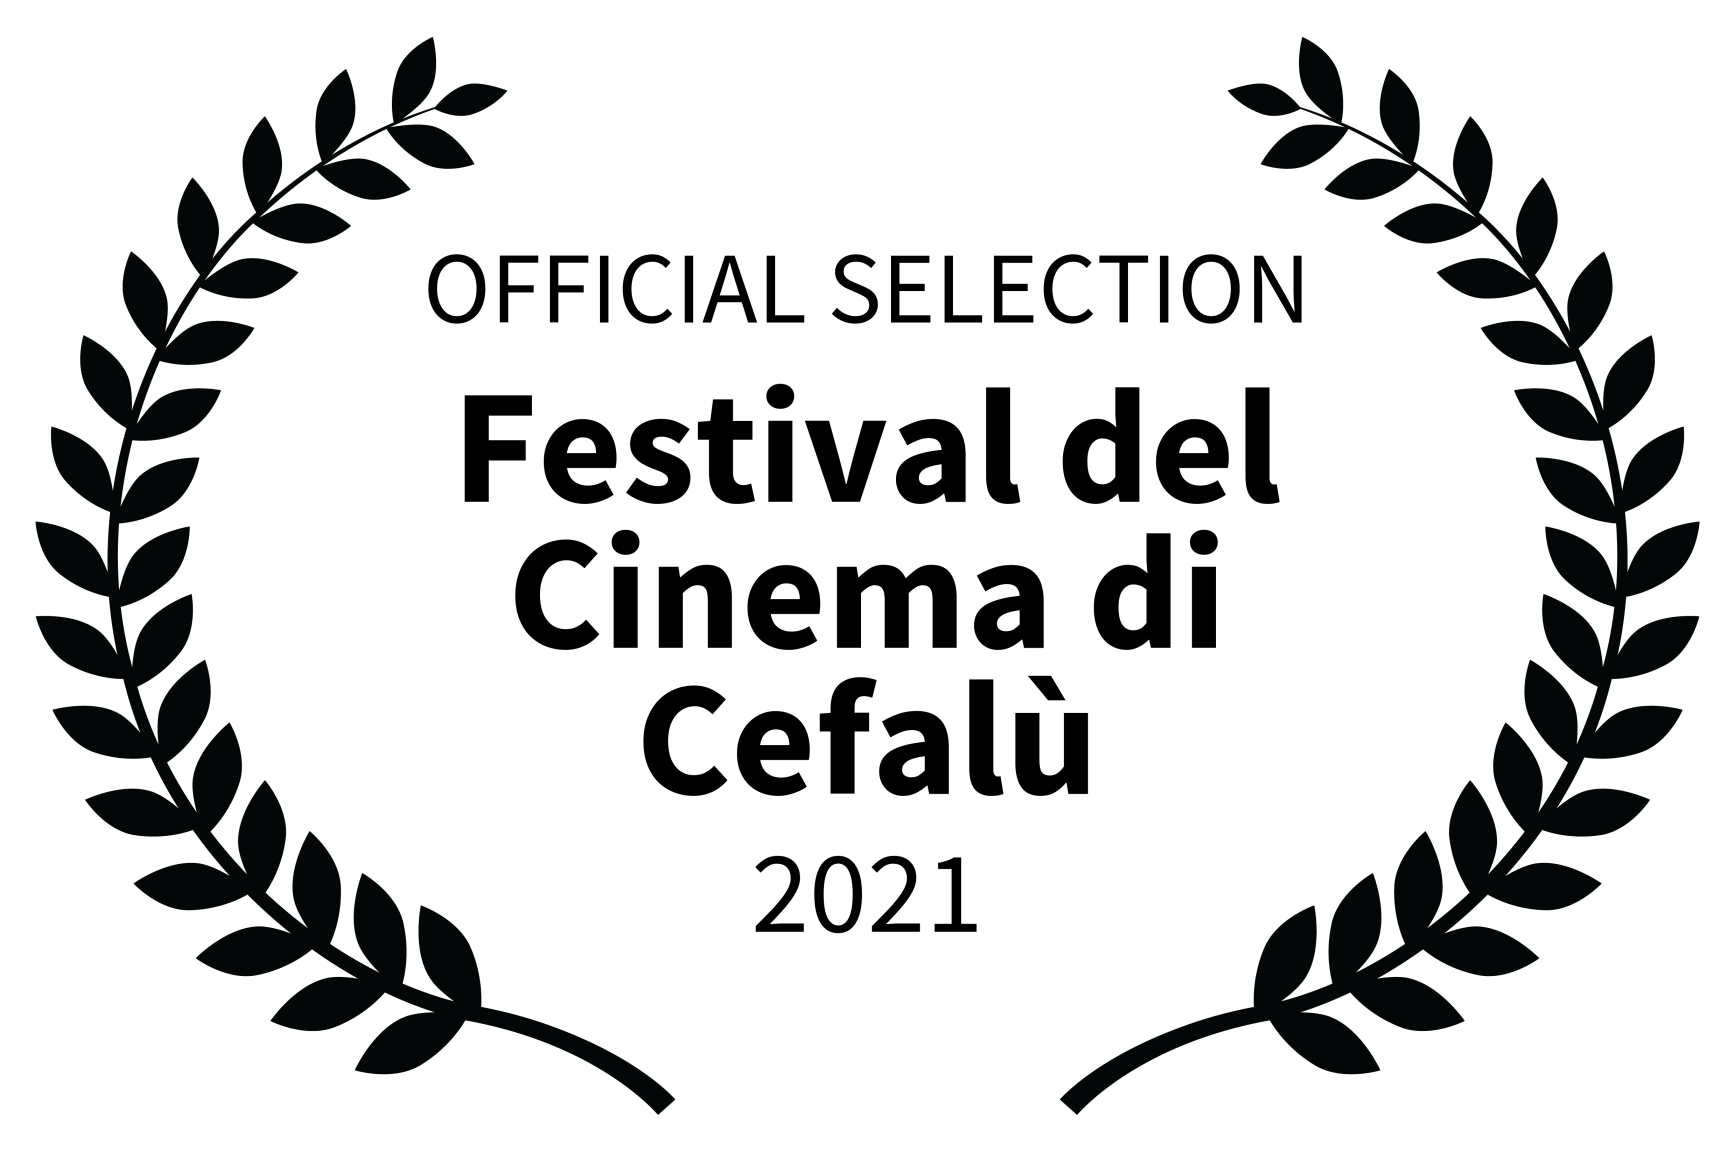 OFFICIAL SELECTION - Festival del Cinema di Cefal - 2021